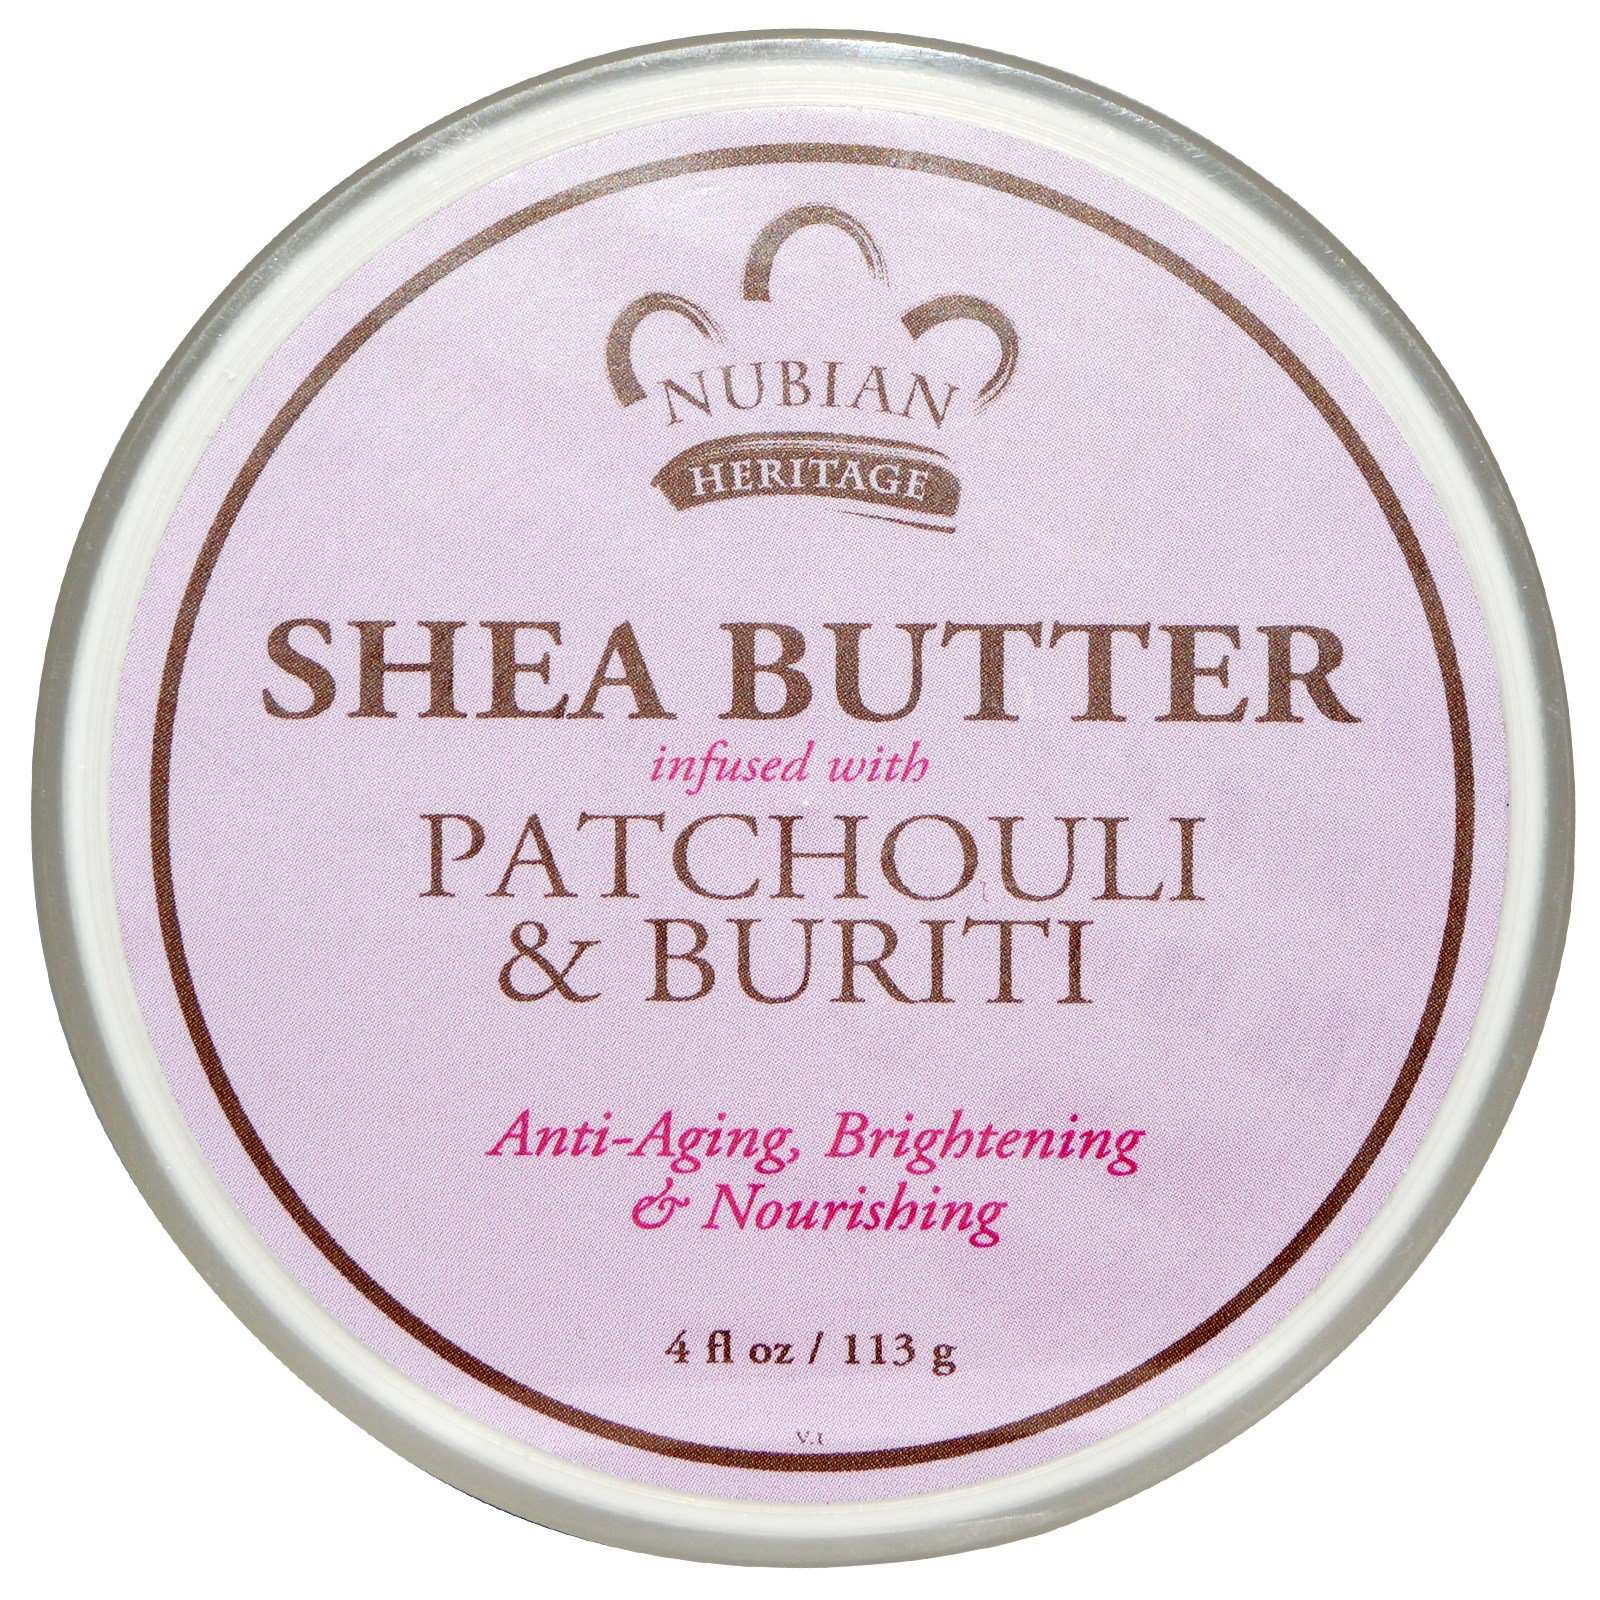 Nubian Heritage, Shea Butter Infused with Patchouli & Buriti, 4 fl oz (113 g) Масло масляного дерева с добавлением Пачули и Бурити, 4 жидкие унции (113 г)